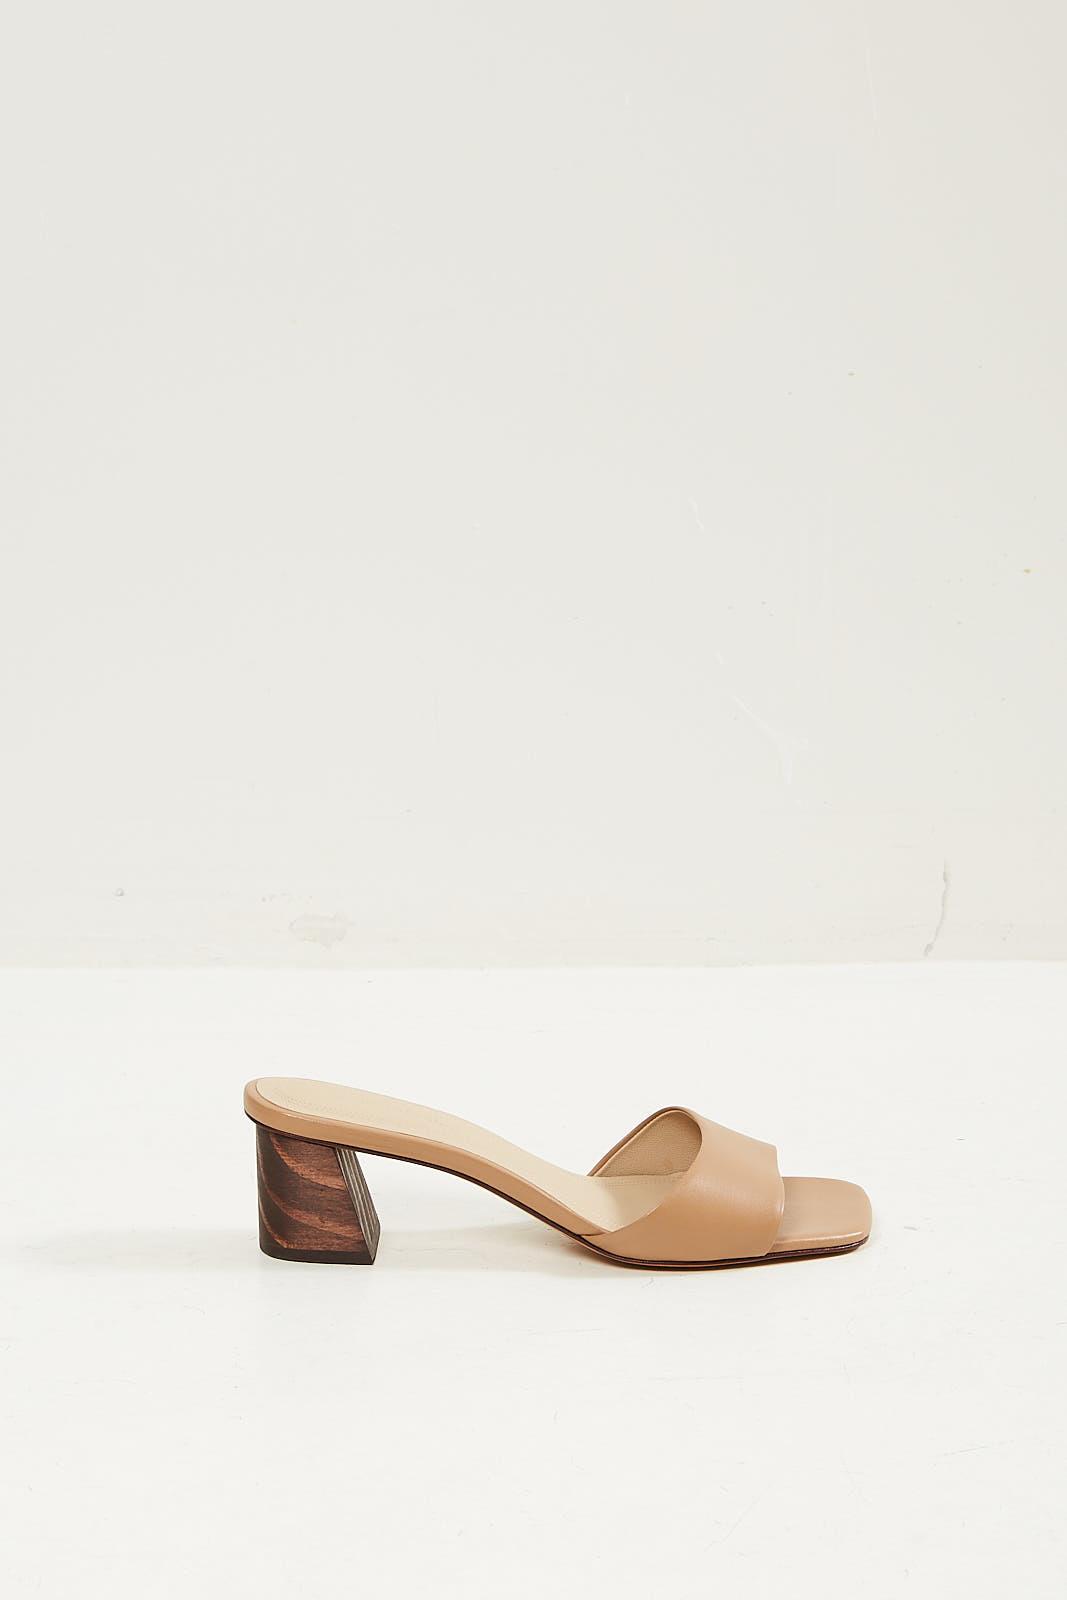 Mari Giudicelli - Carmen sandal